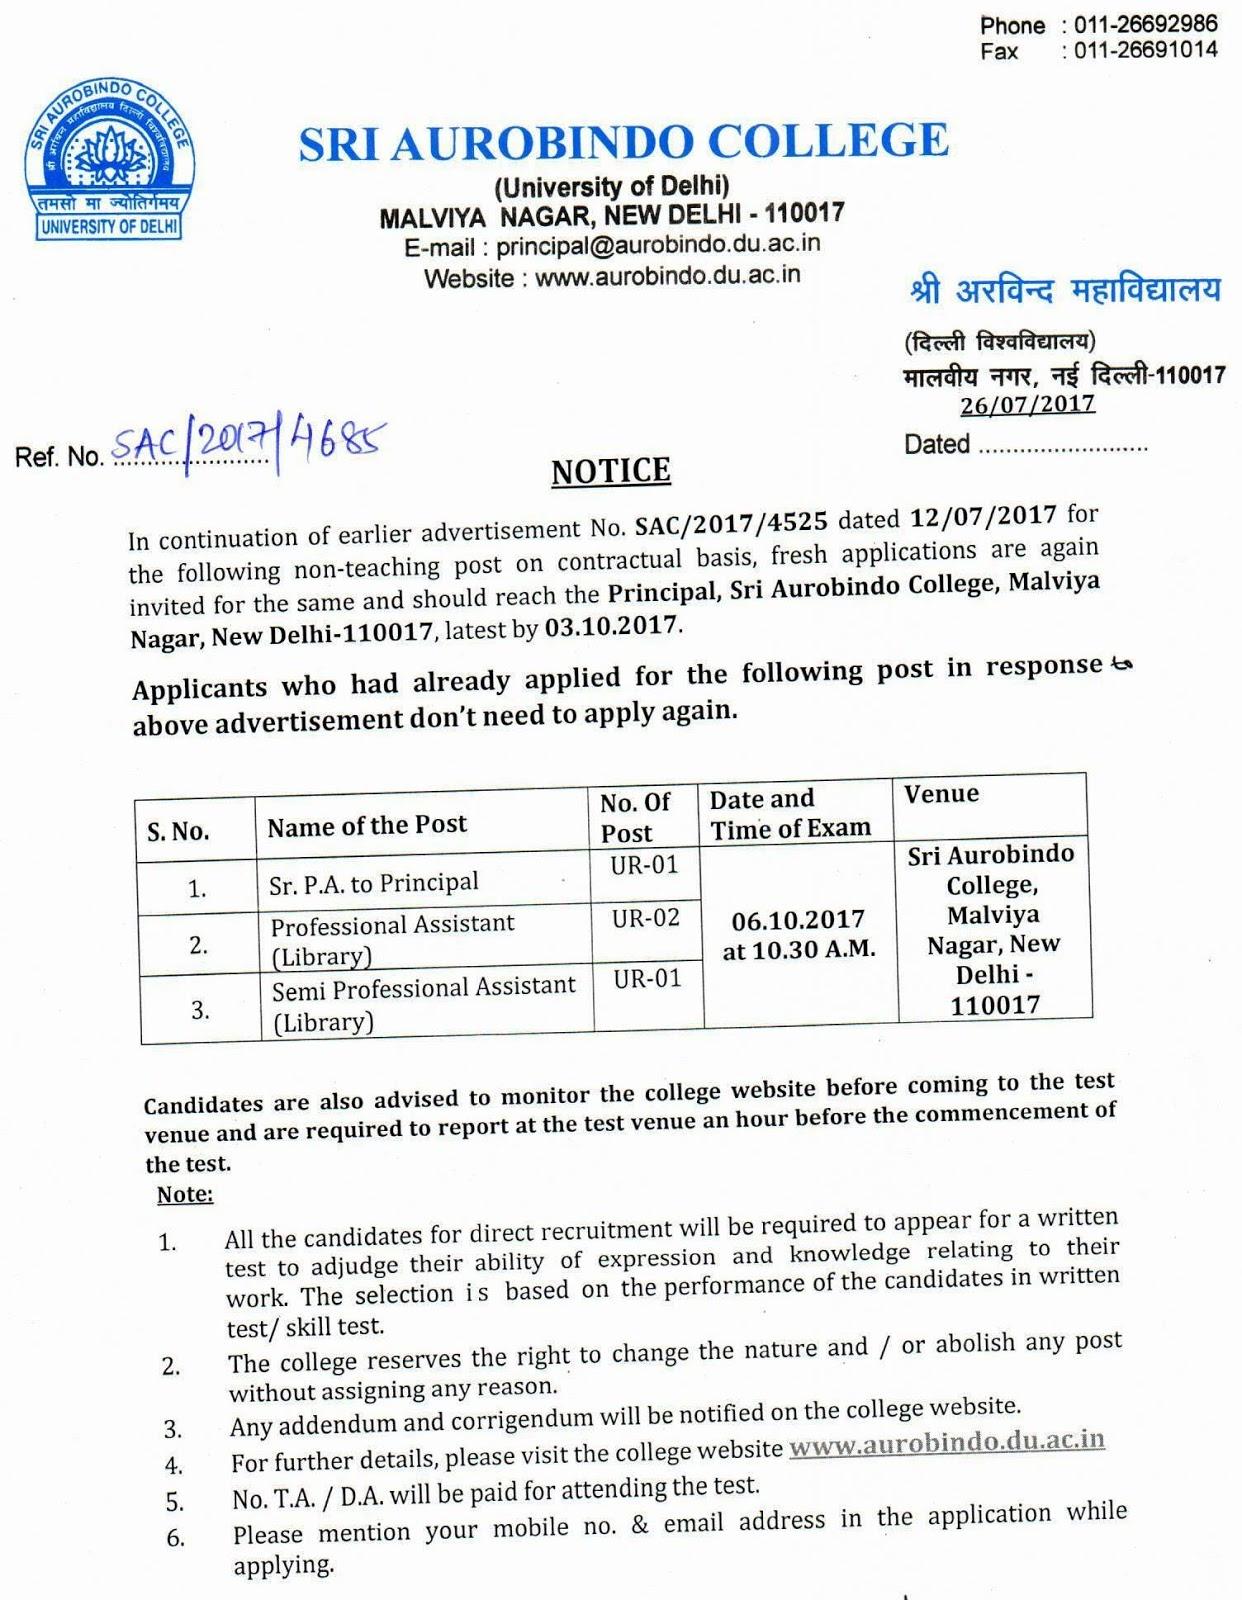 Professional assistant and semi professional assistant vacancy at sri aurobindo college university of delhi malviya nagar